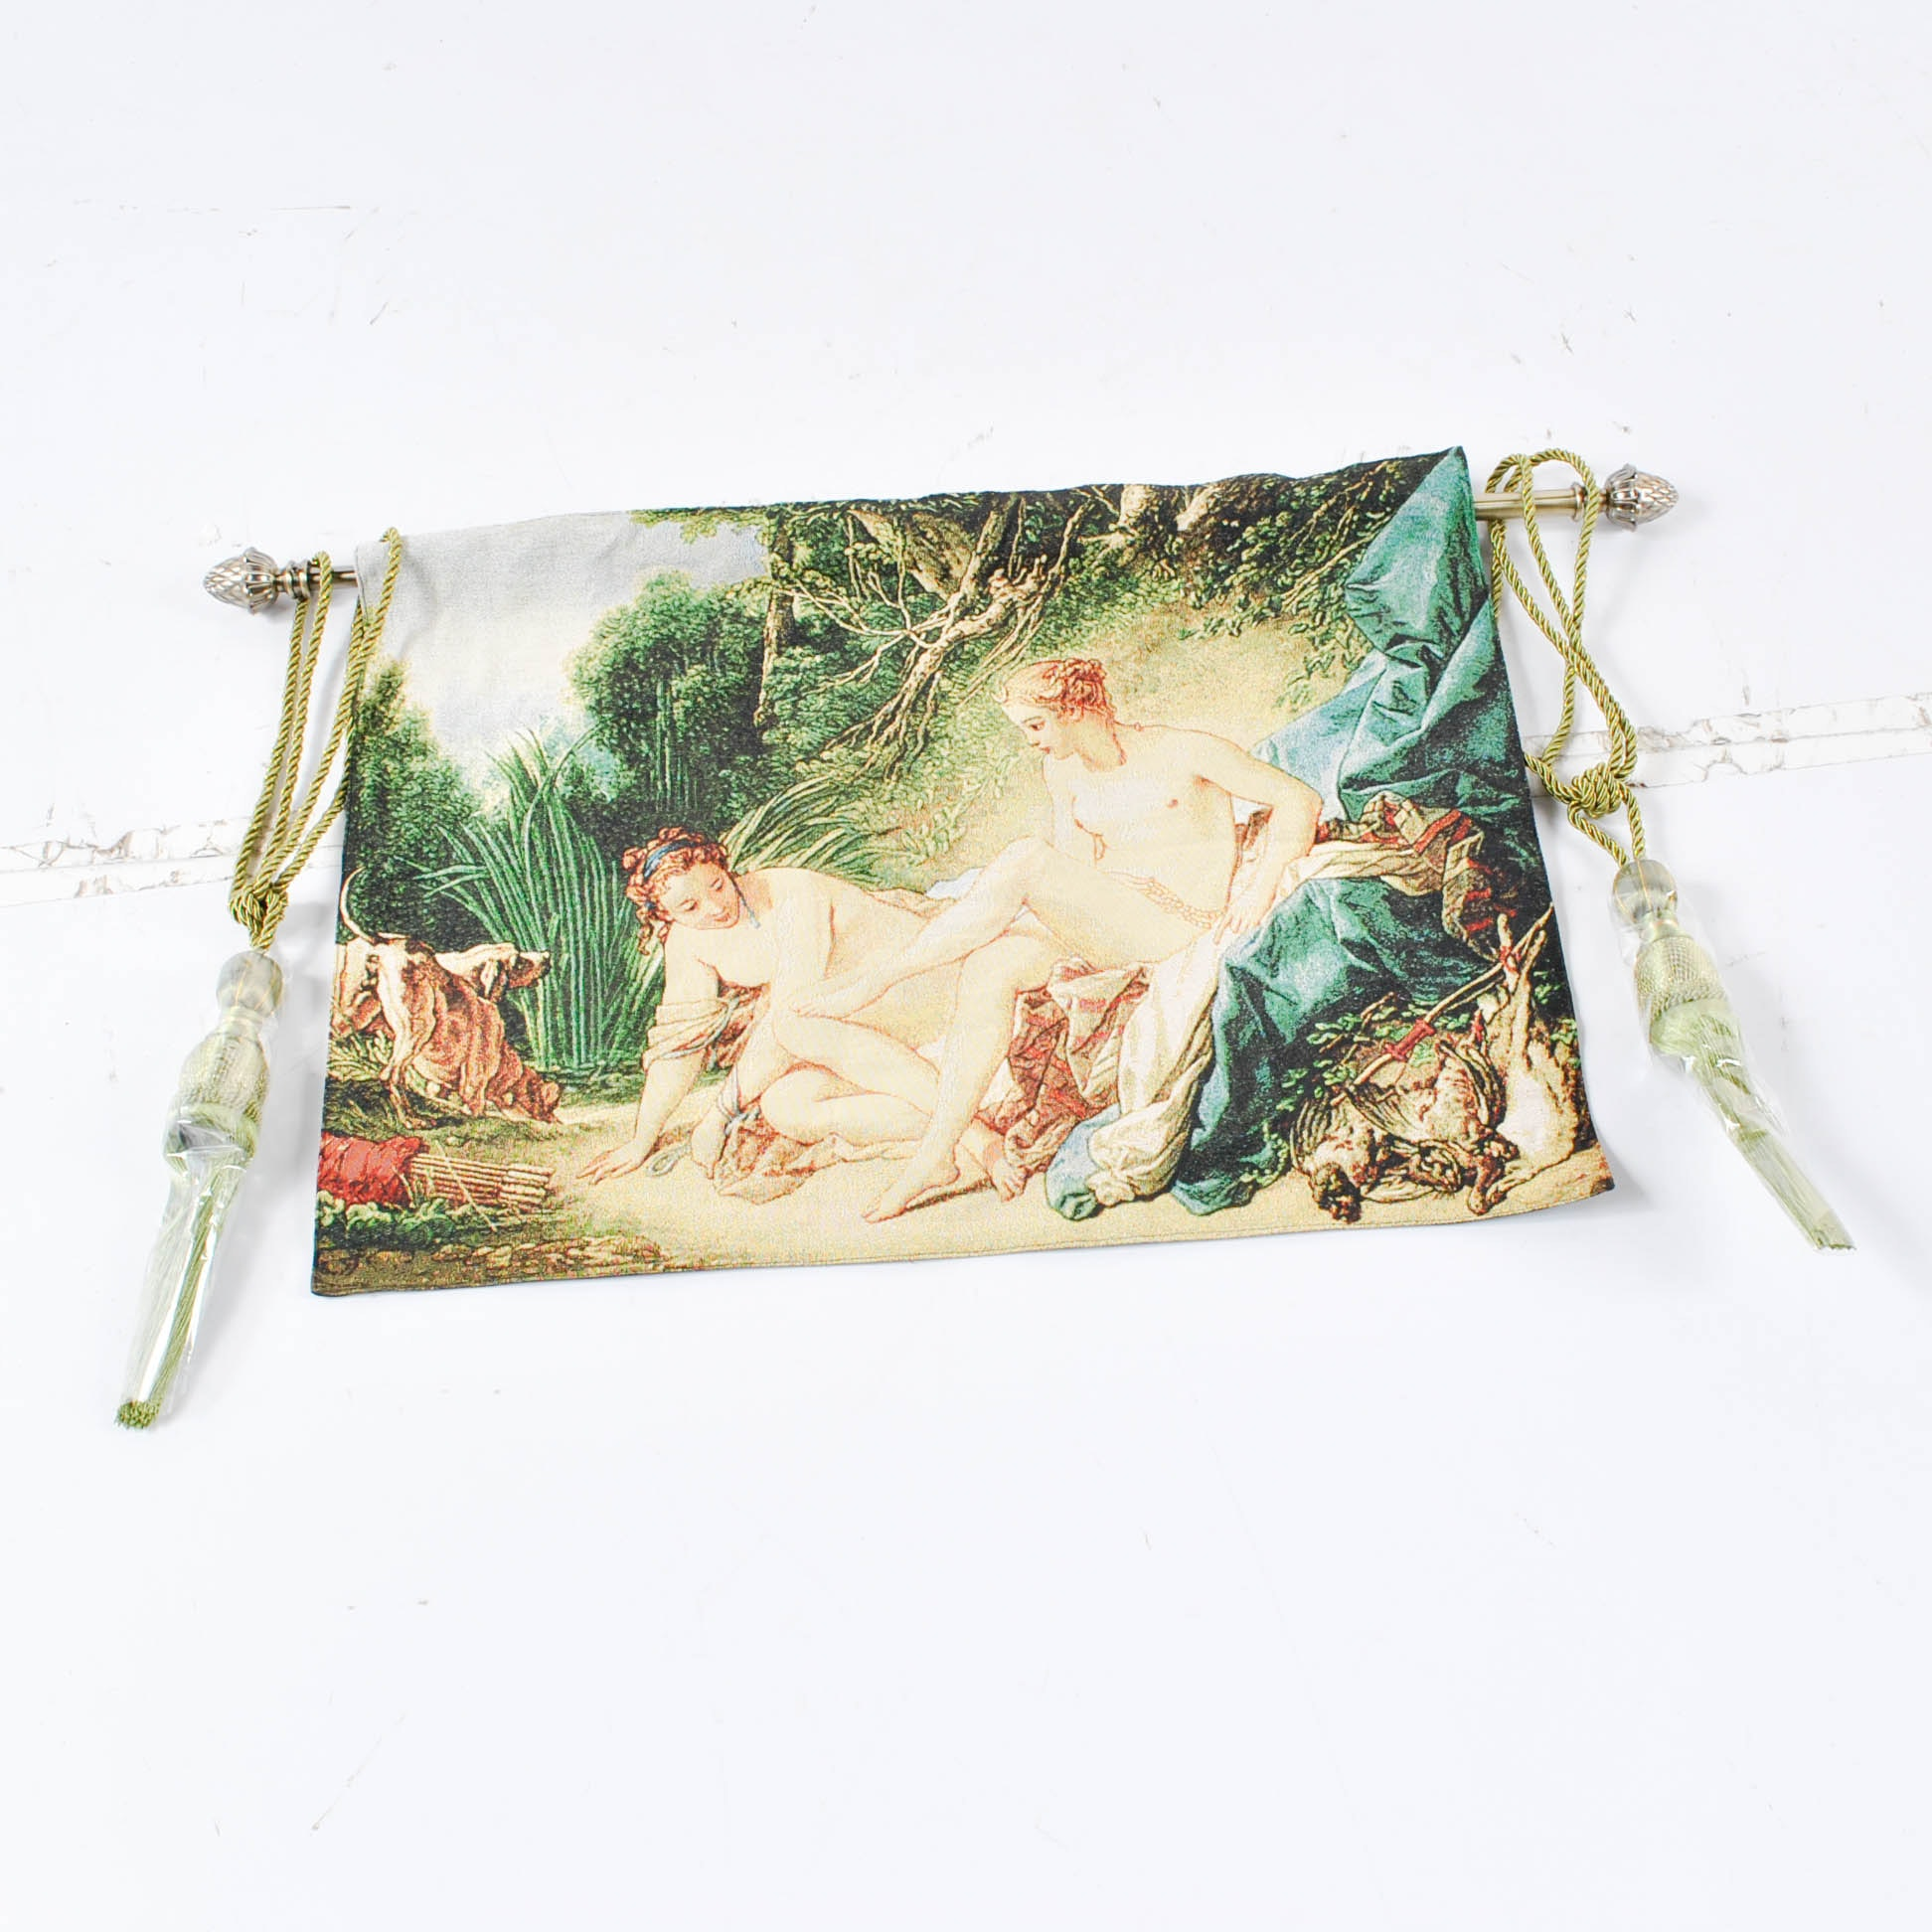 Machine Made Tapestry of Pastoral Scene